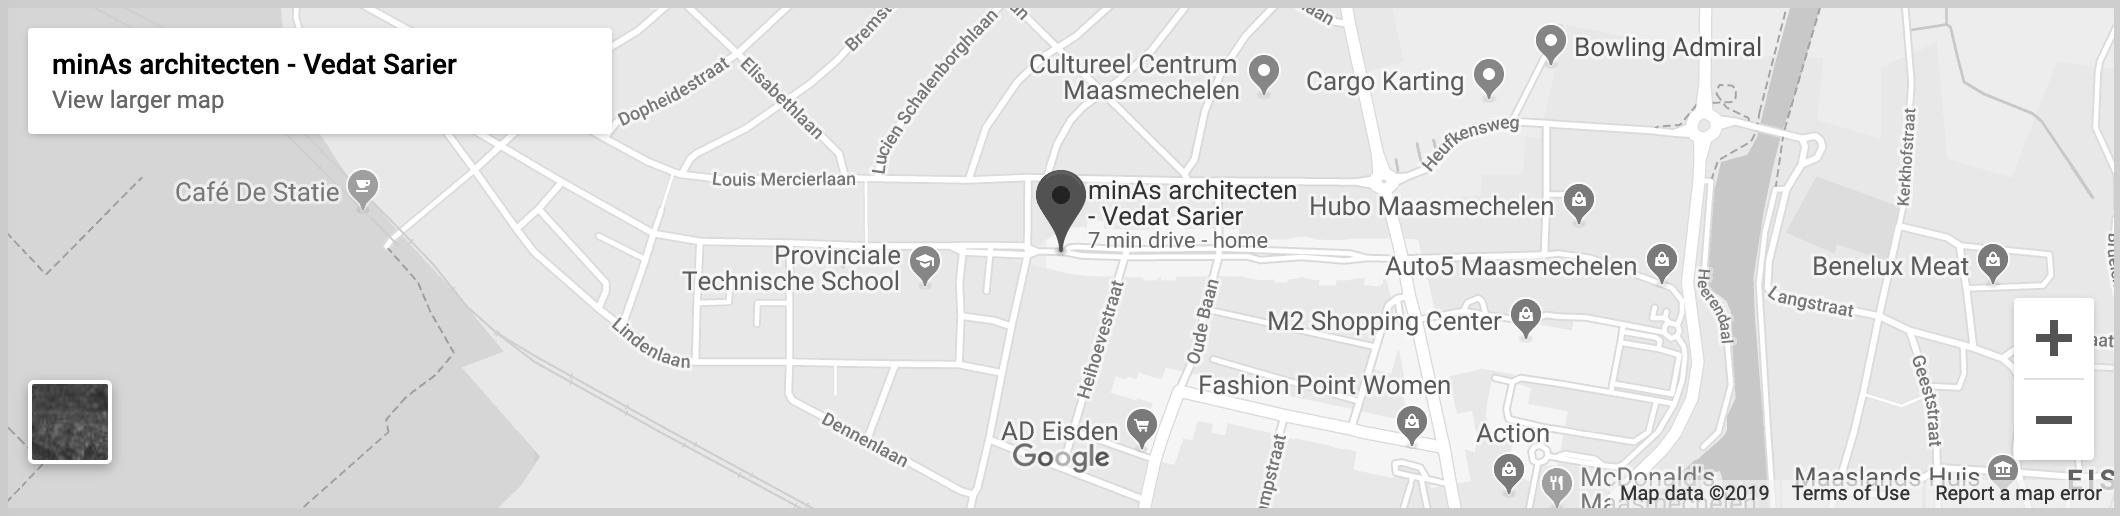 Google Maps minAs